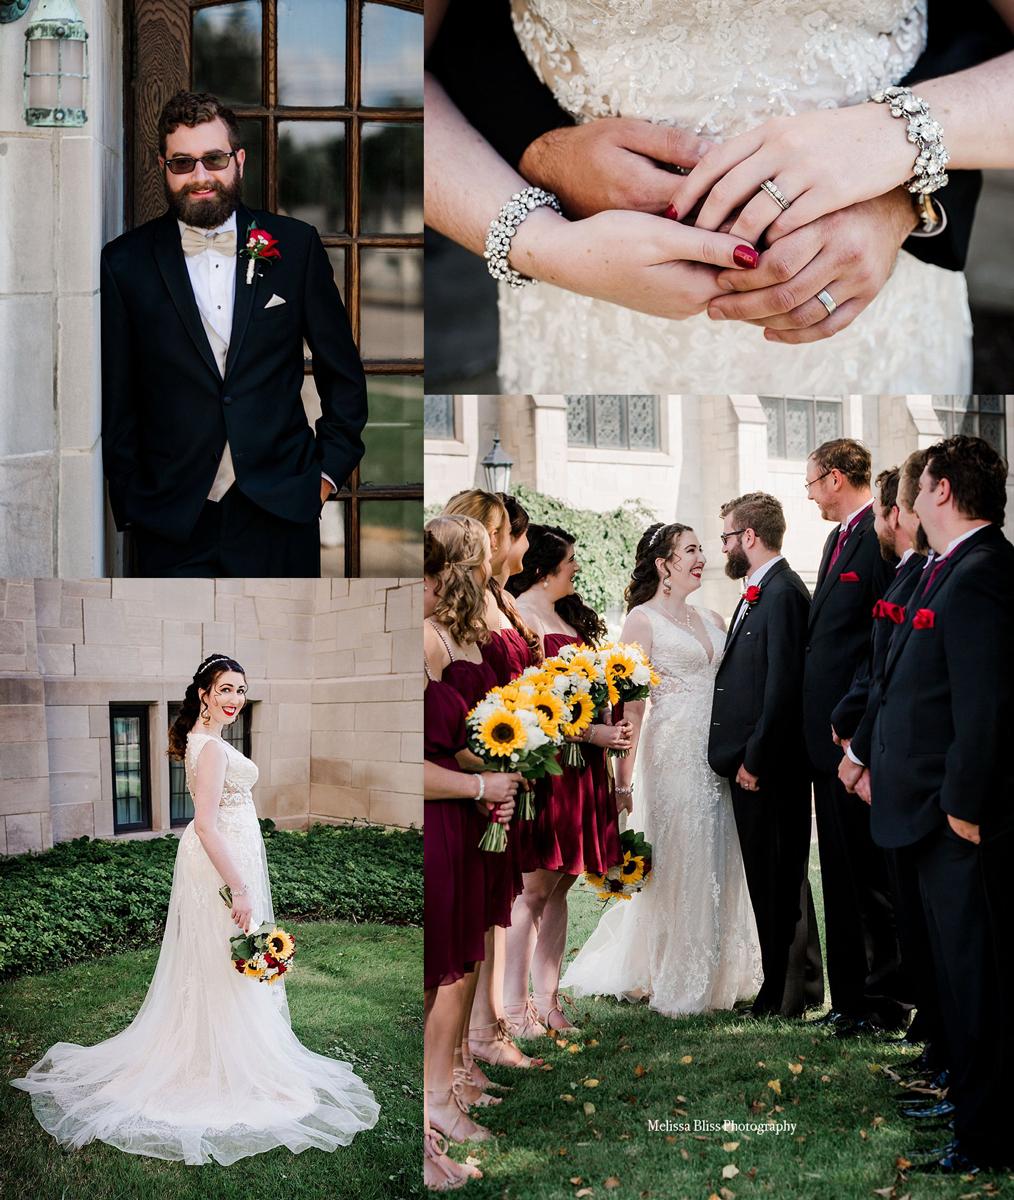 bride-groom-wedding-party-portraits-blue-ridge-mountain-wedding.jpg